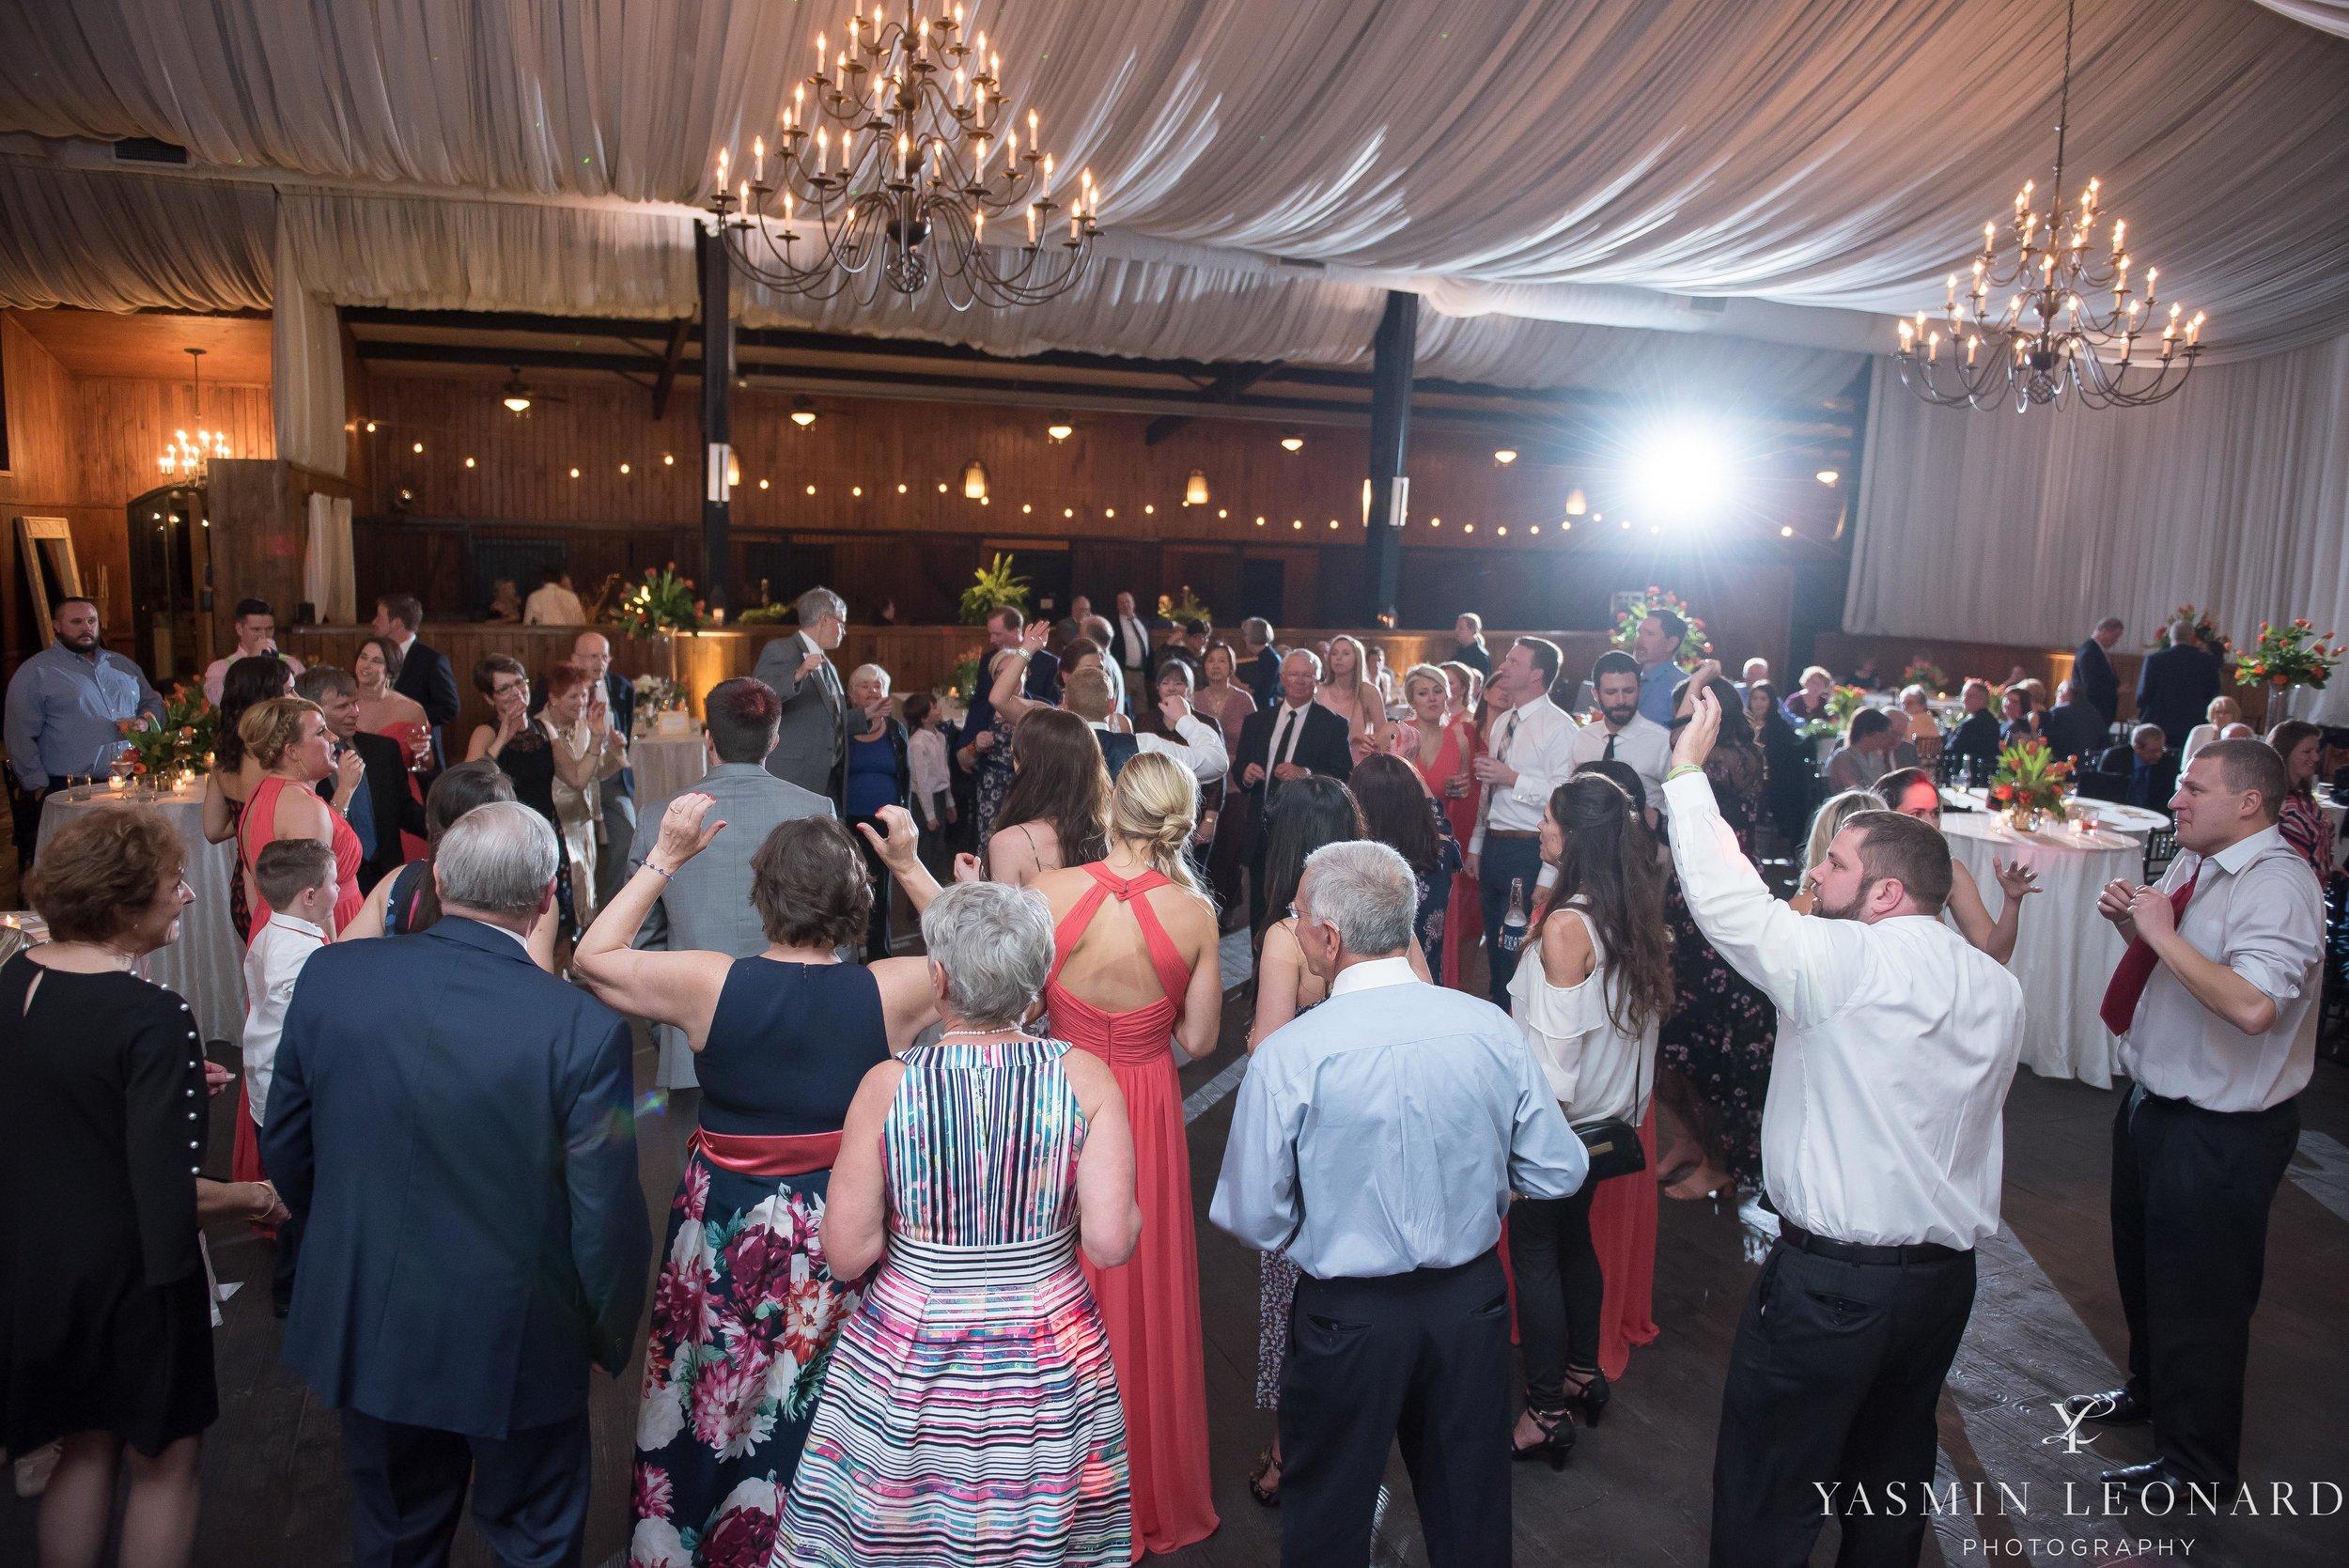 Adaumont Farm - Adaumont Farm Weddings - Trinity Weddings - NC Weddings - Yasmin Leonard Photography-74.jpg